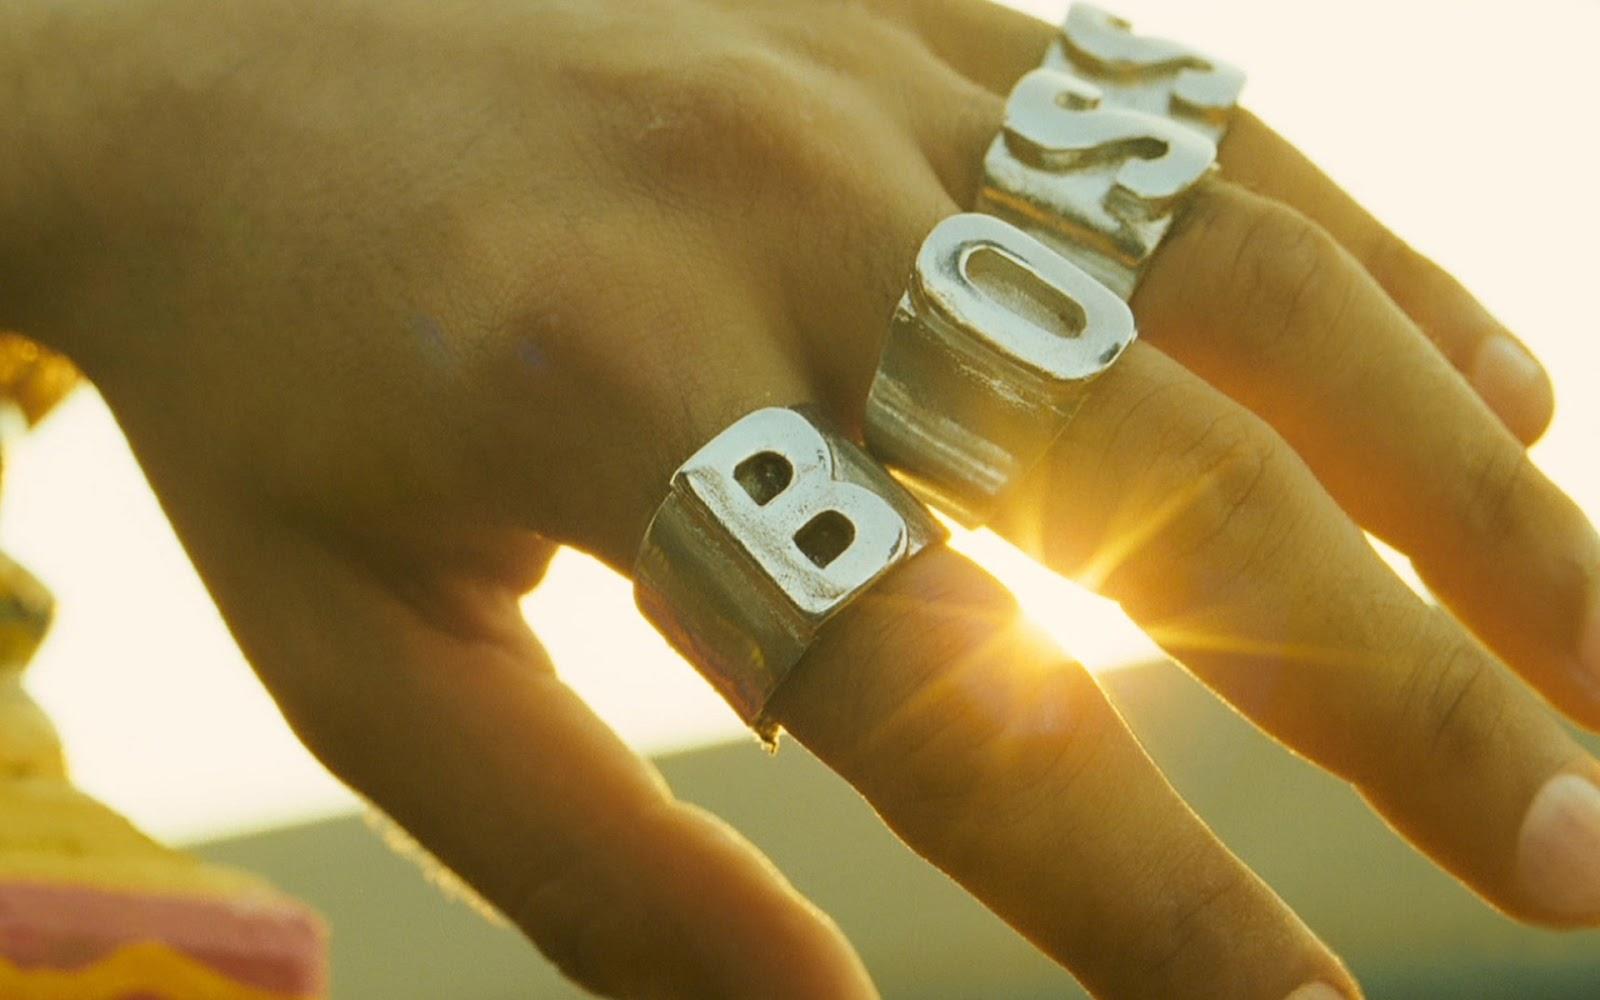 Boss Hindi Movie 2013 Hd Desktop Wallpapers And Movie -2027